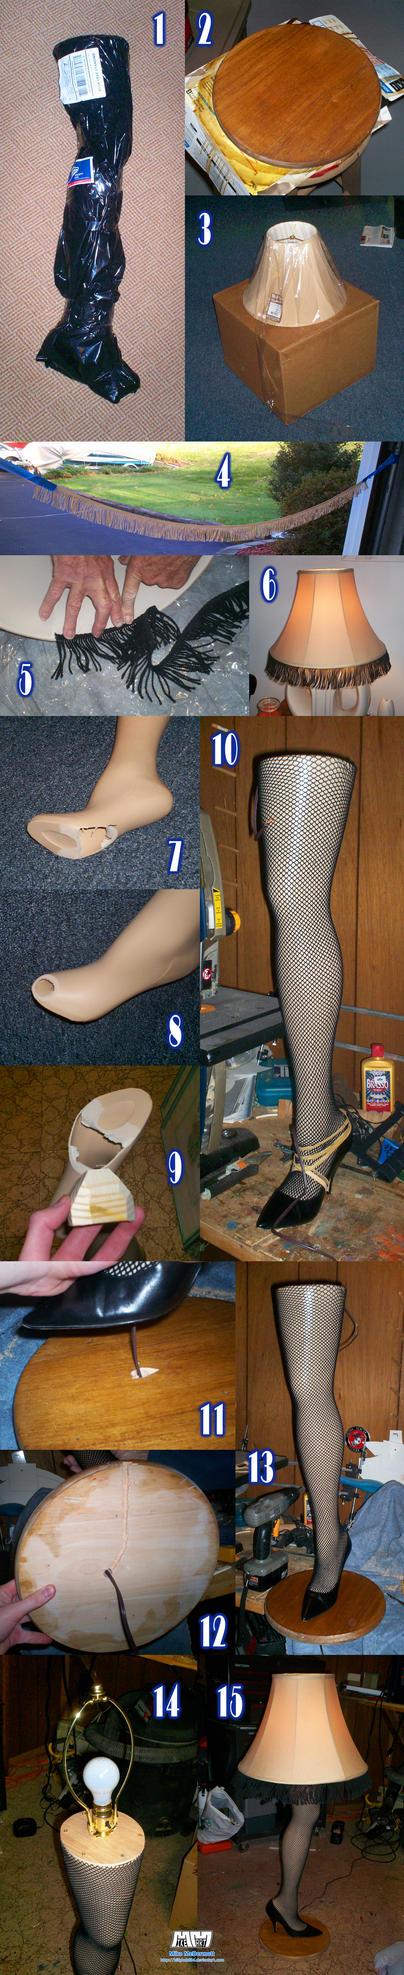 Leg Lamp In-Progress Shots by billybob884